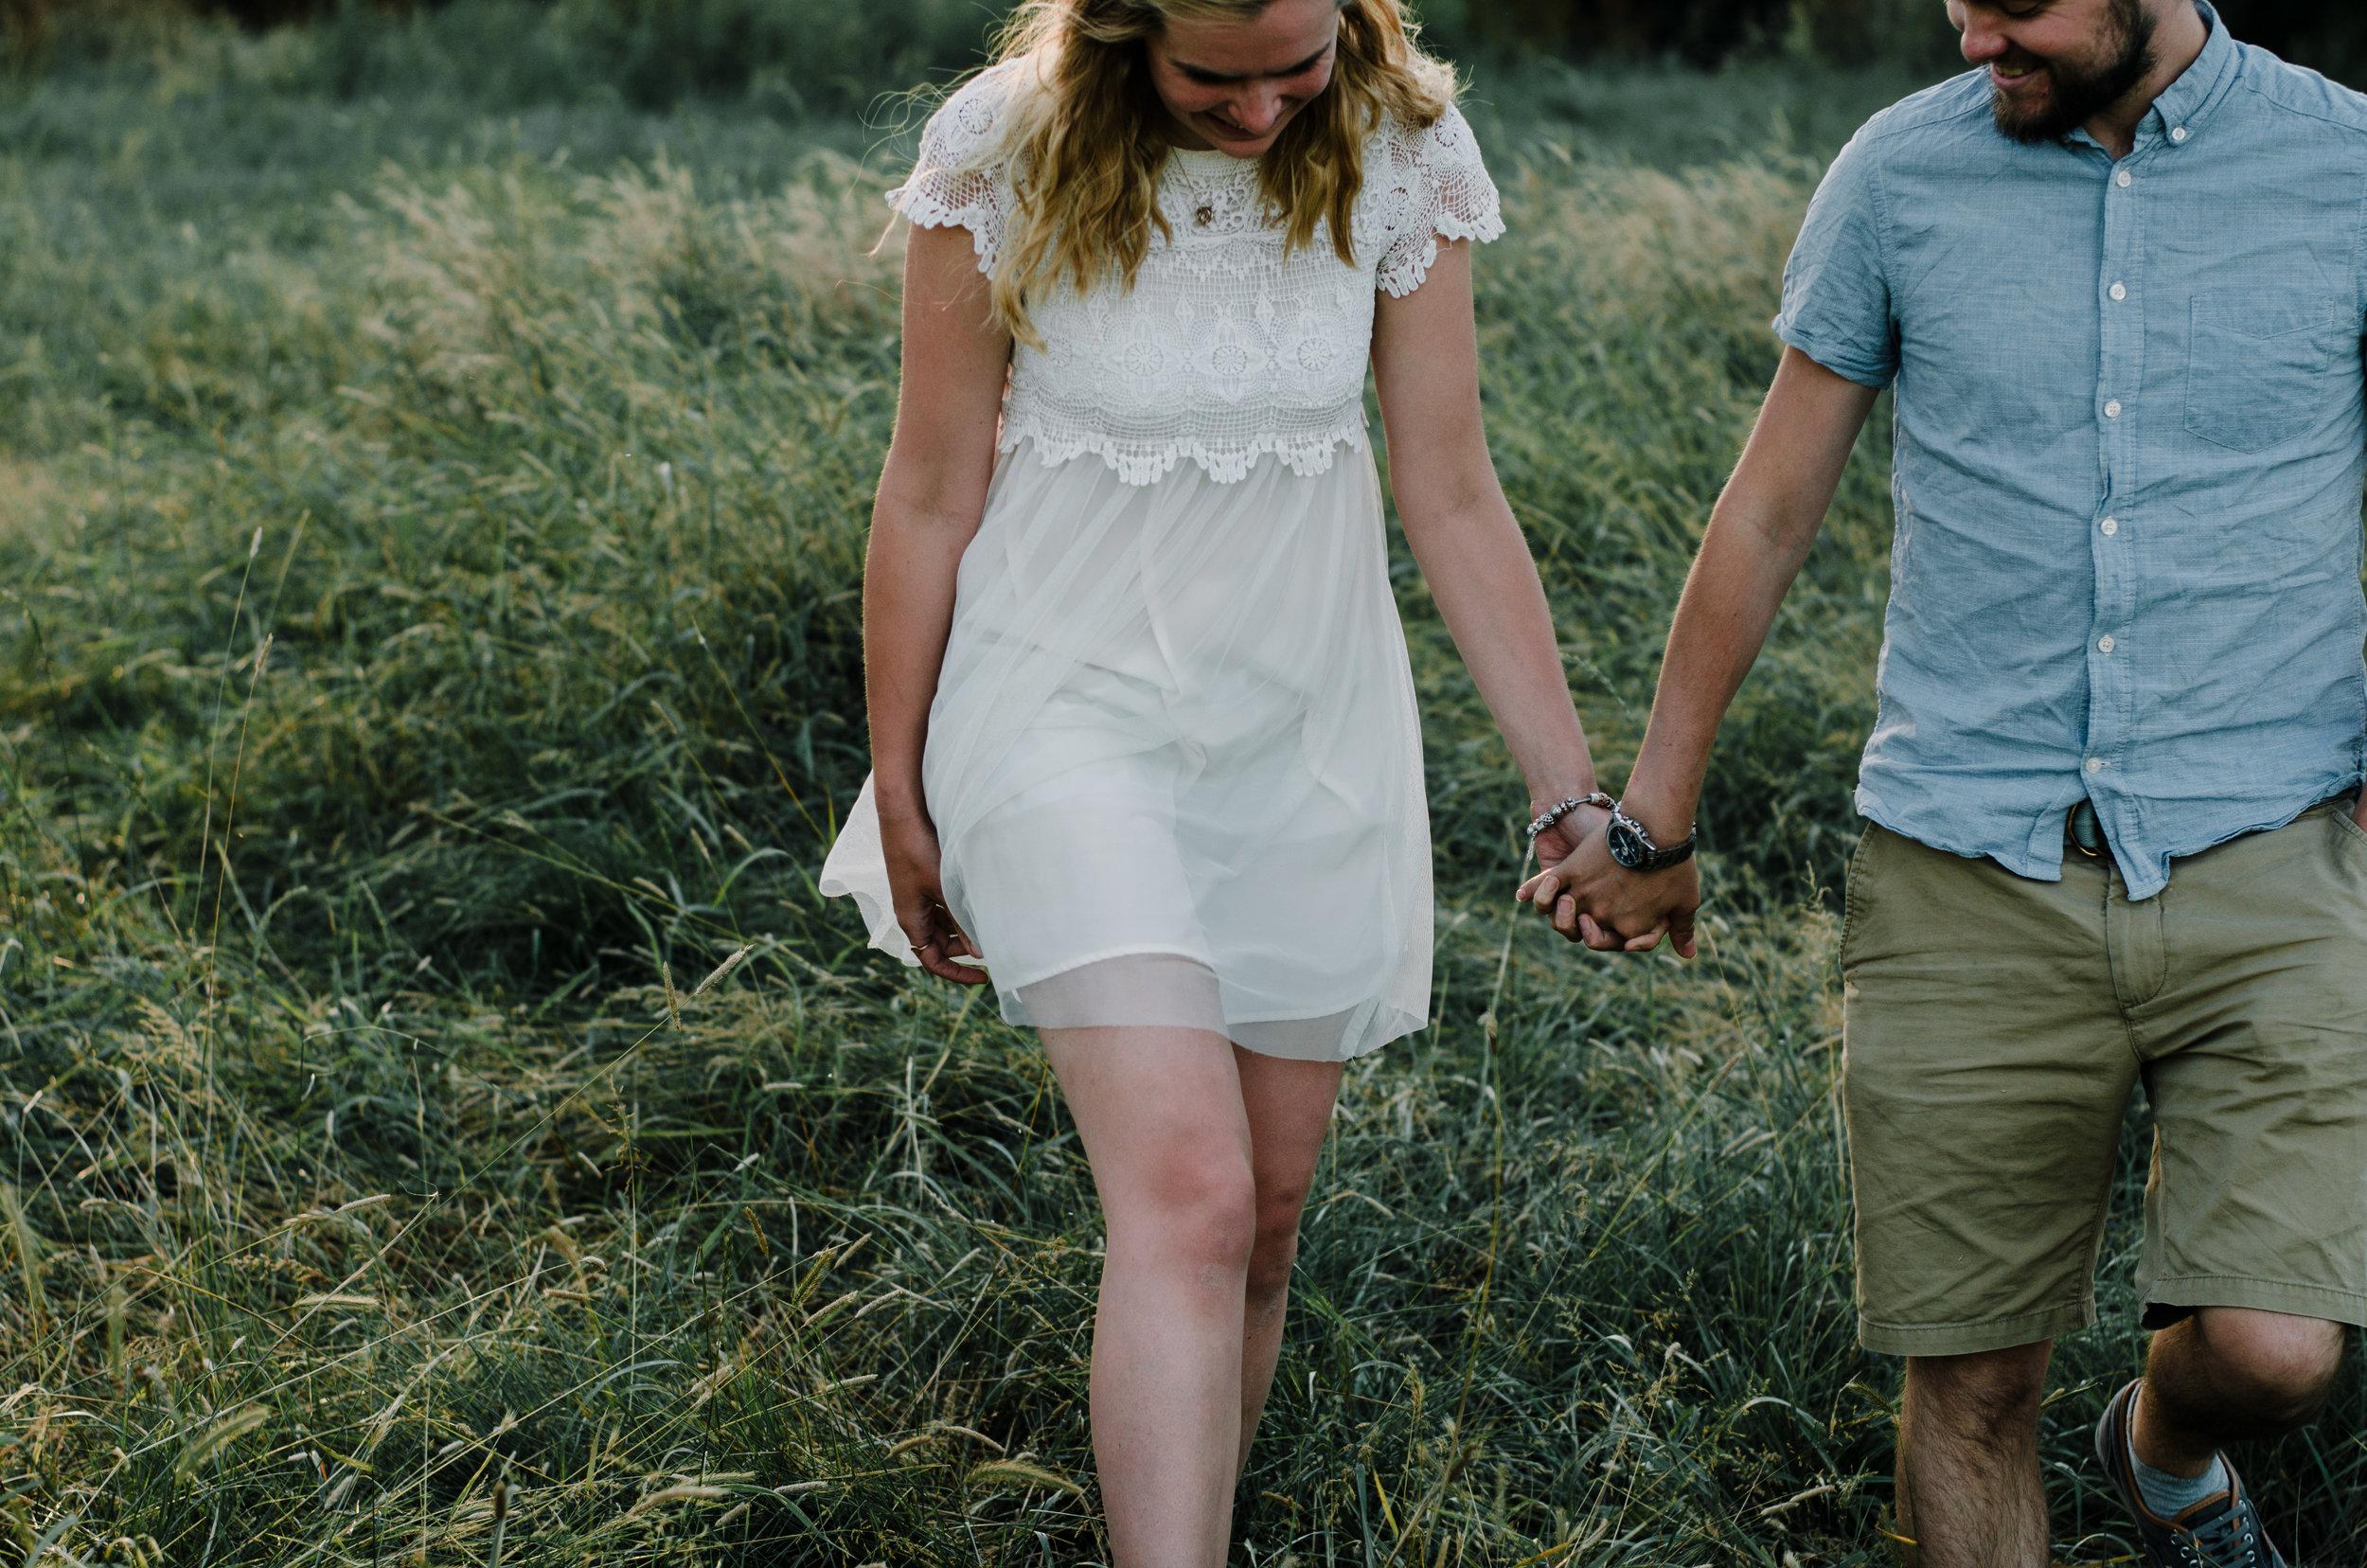 Gina & Chris - Barcombe Mills - Couple Session - Aiste Saulyte Photography-15.jpg